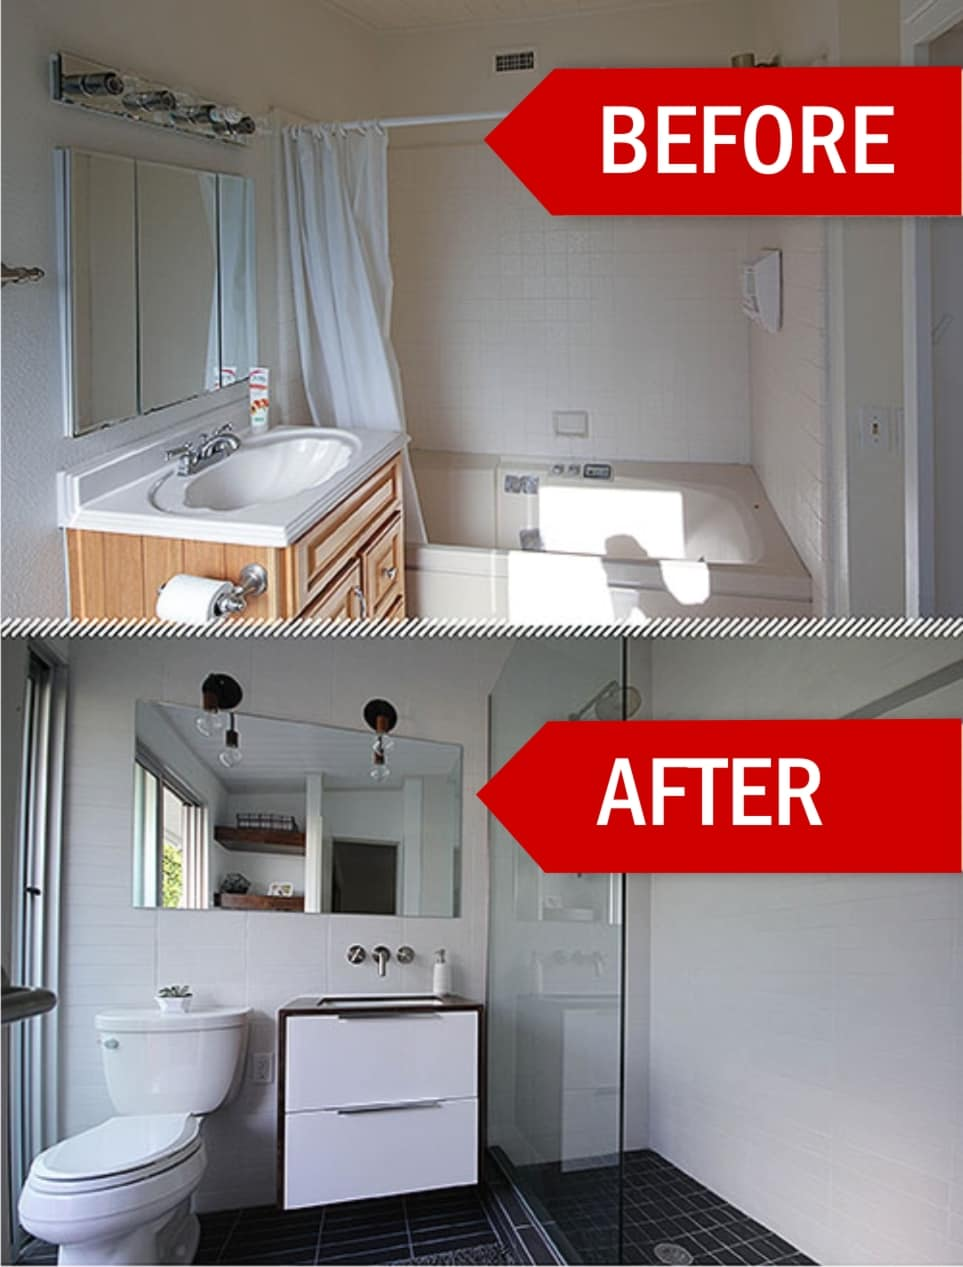 Magnificent Ative Wall Tiles Kitchen Ideas - Best Interior Design ...